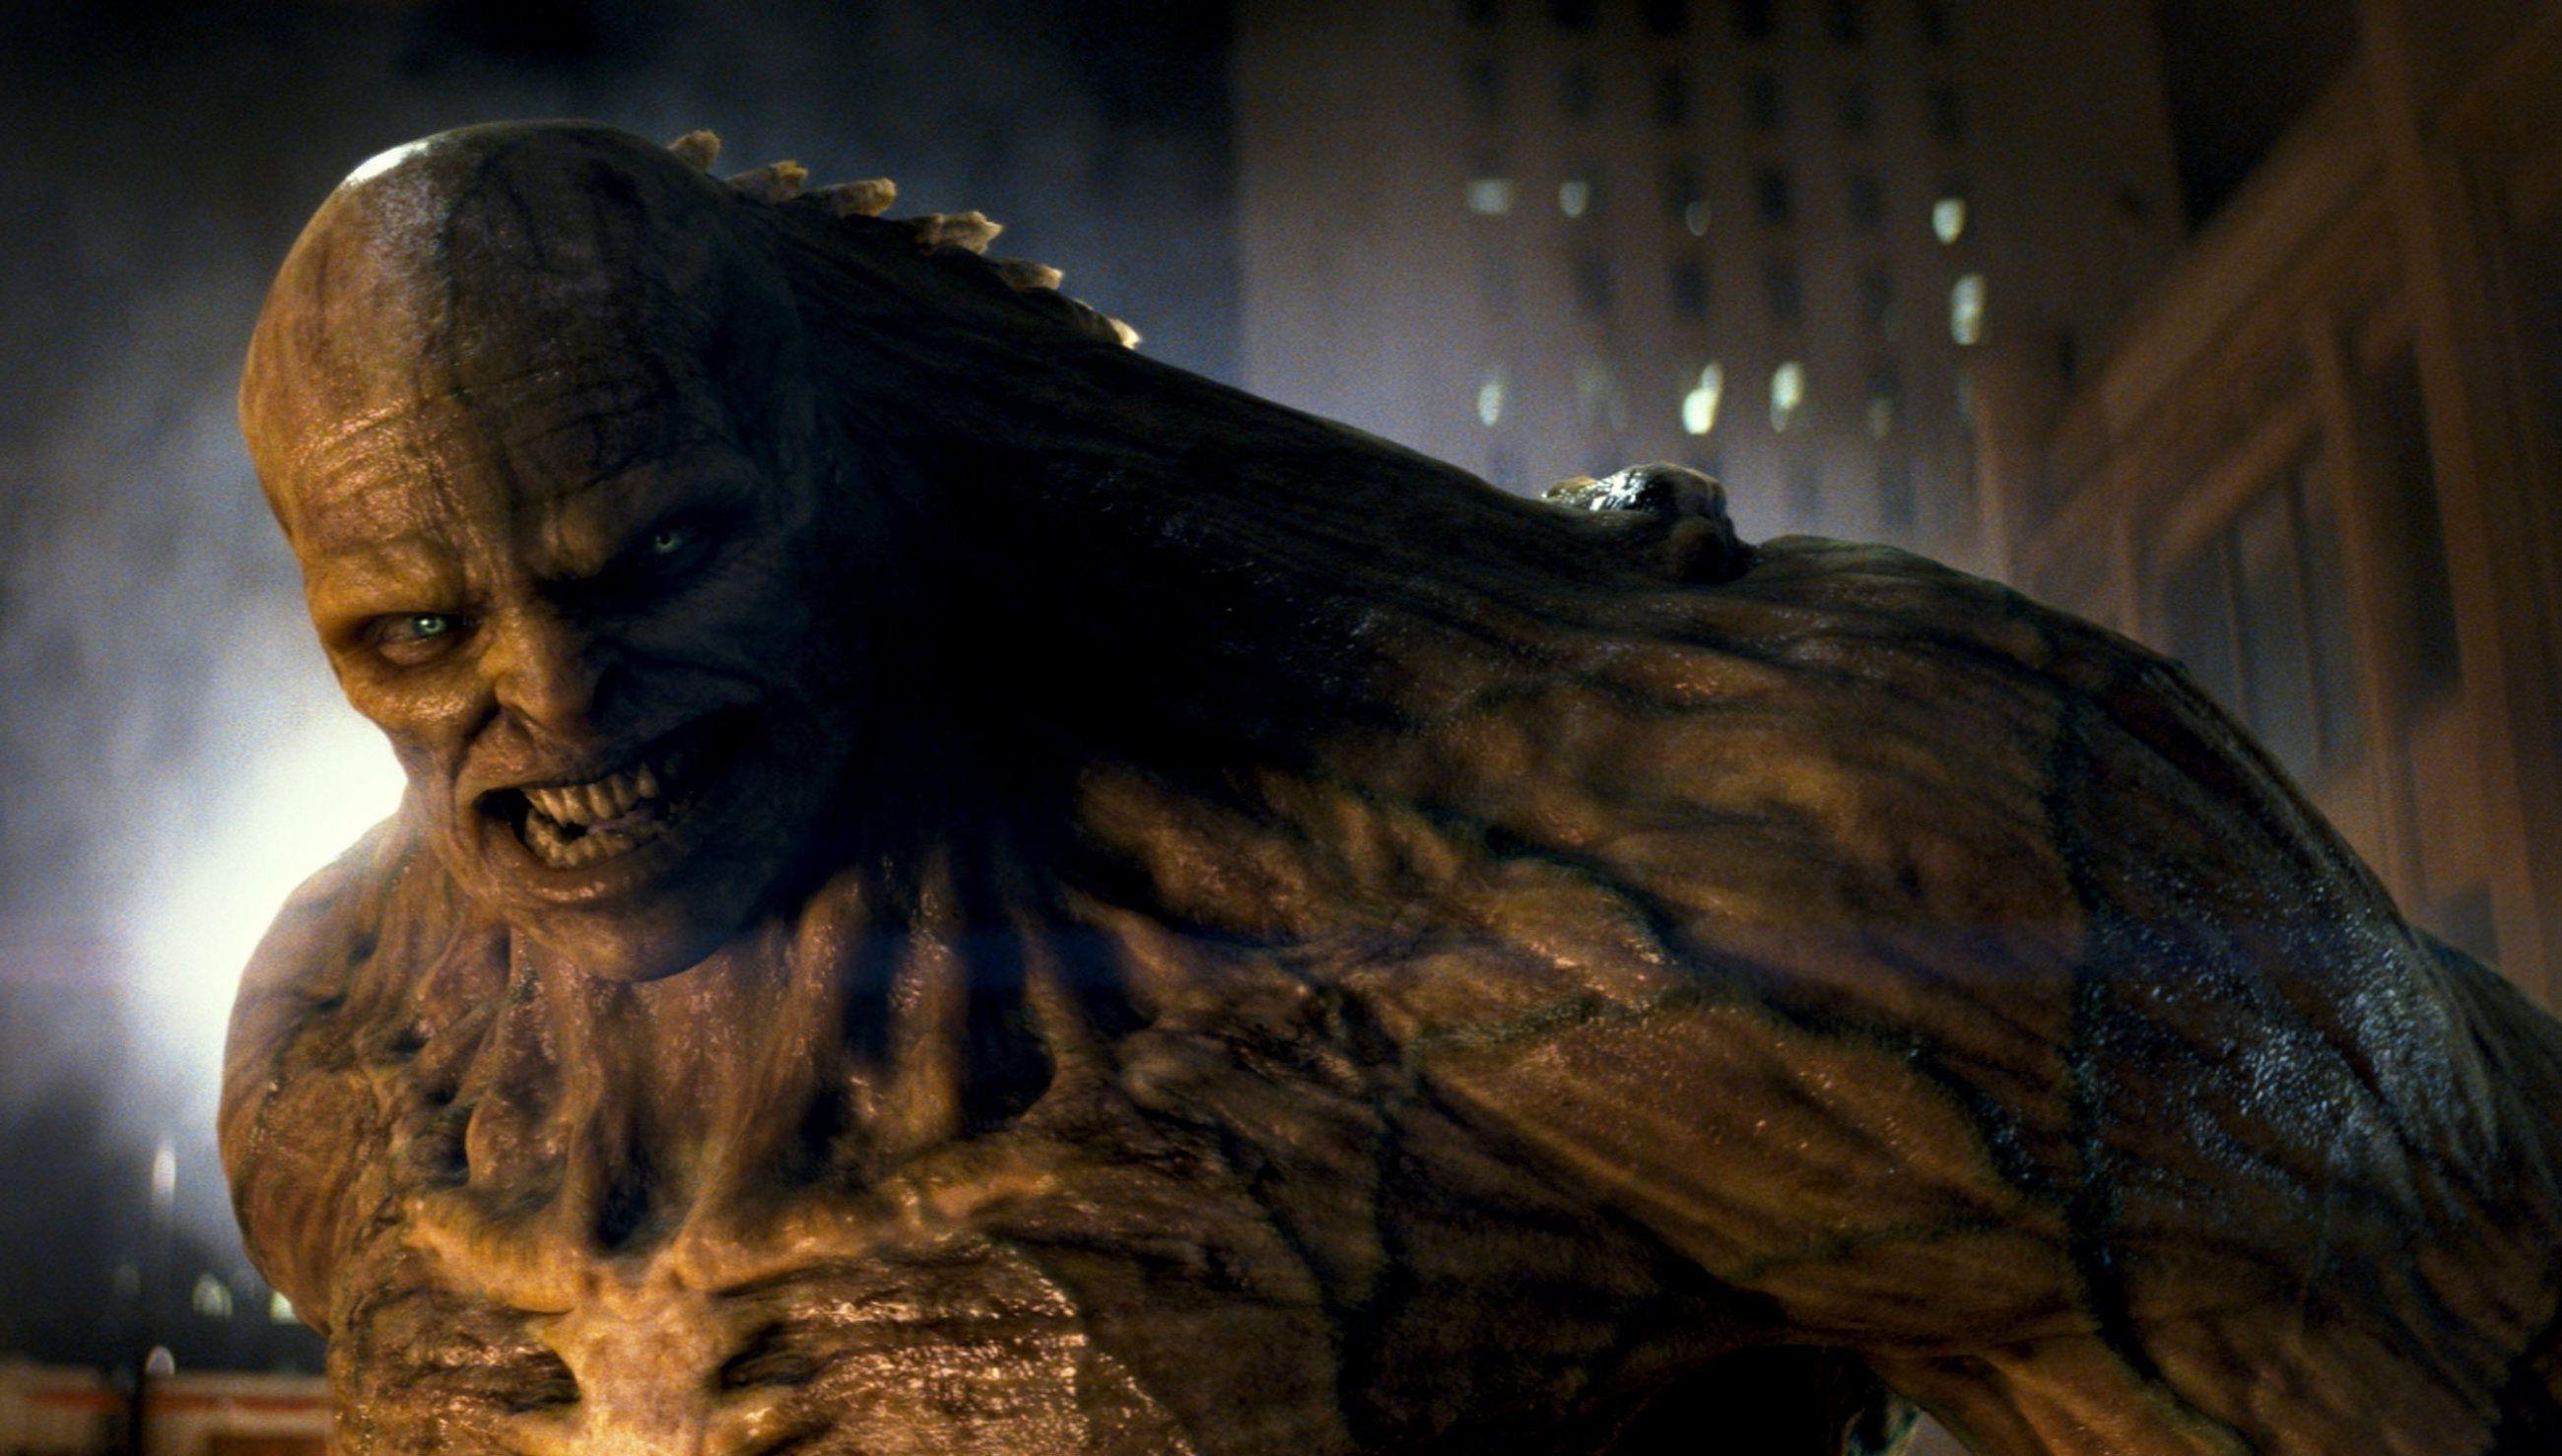 Abomination (The Incredible Hulk)   The incredible hulk 2008 ...